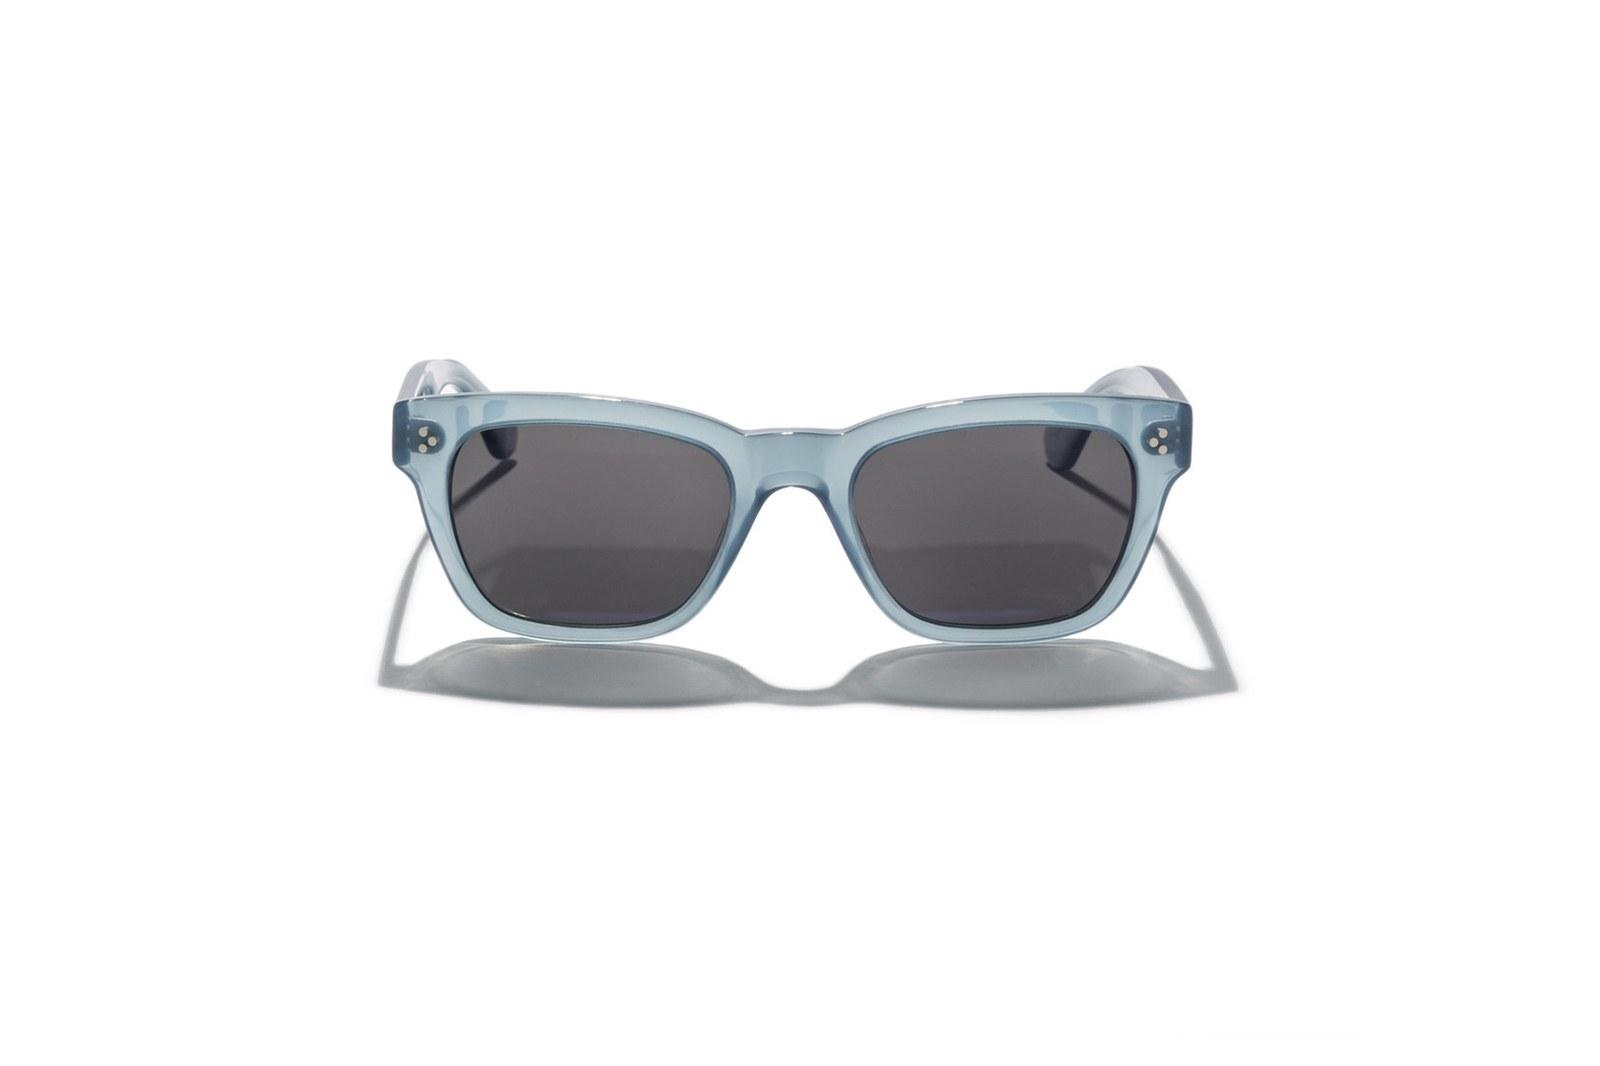 Kính Saturdays NYC Perry sunglasses